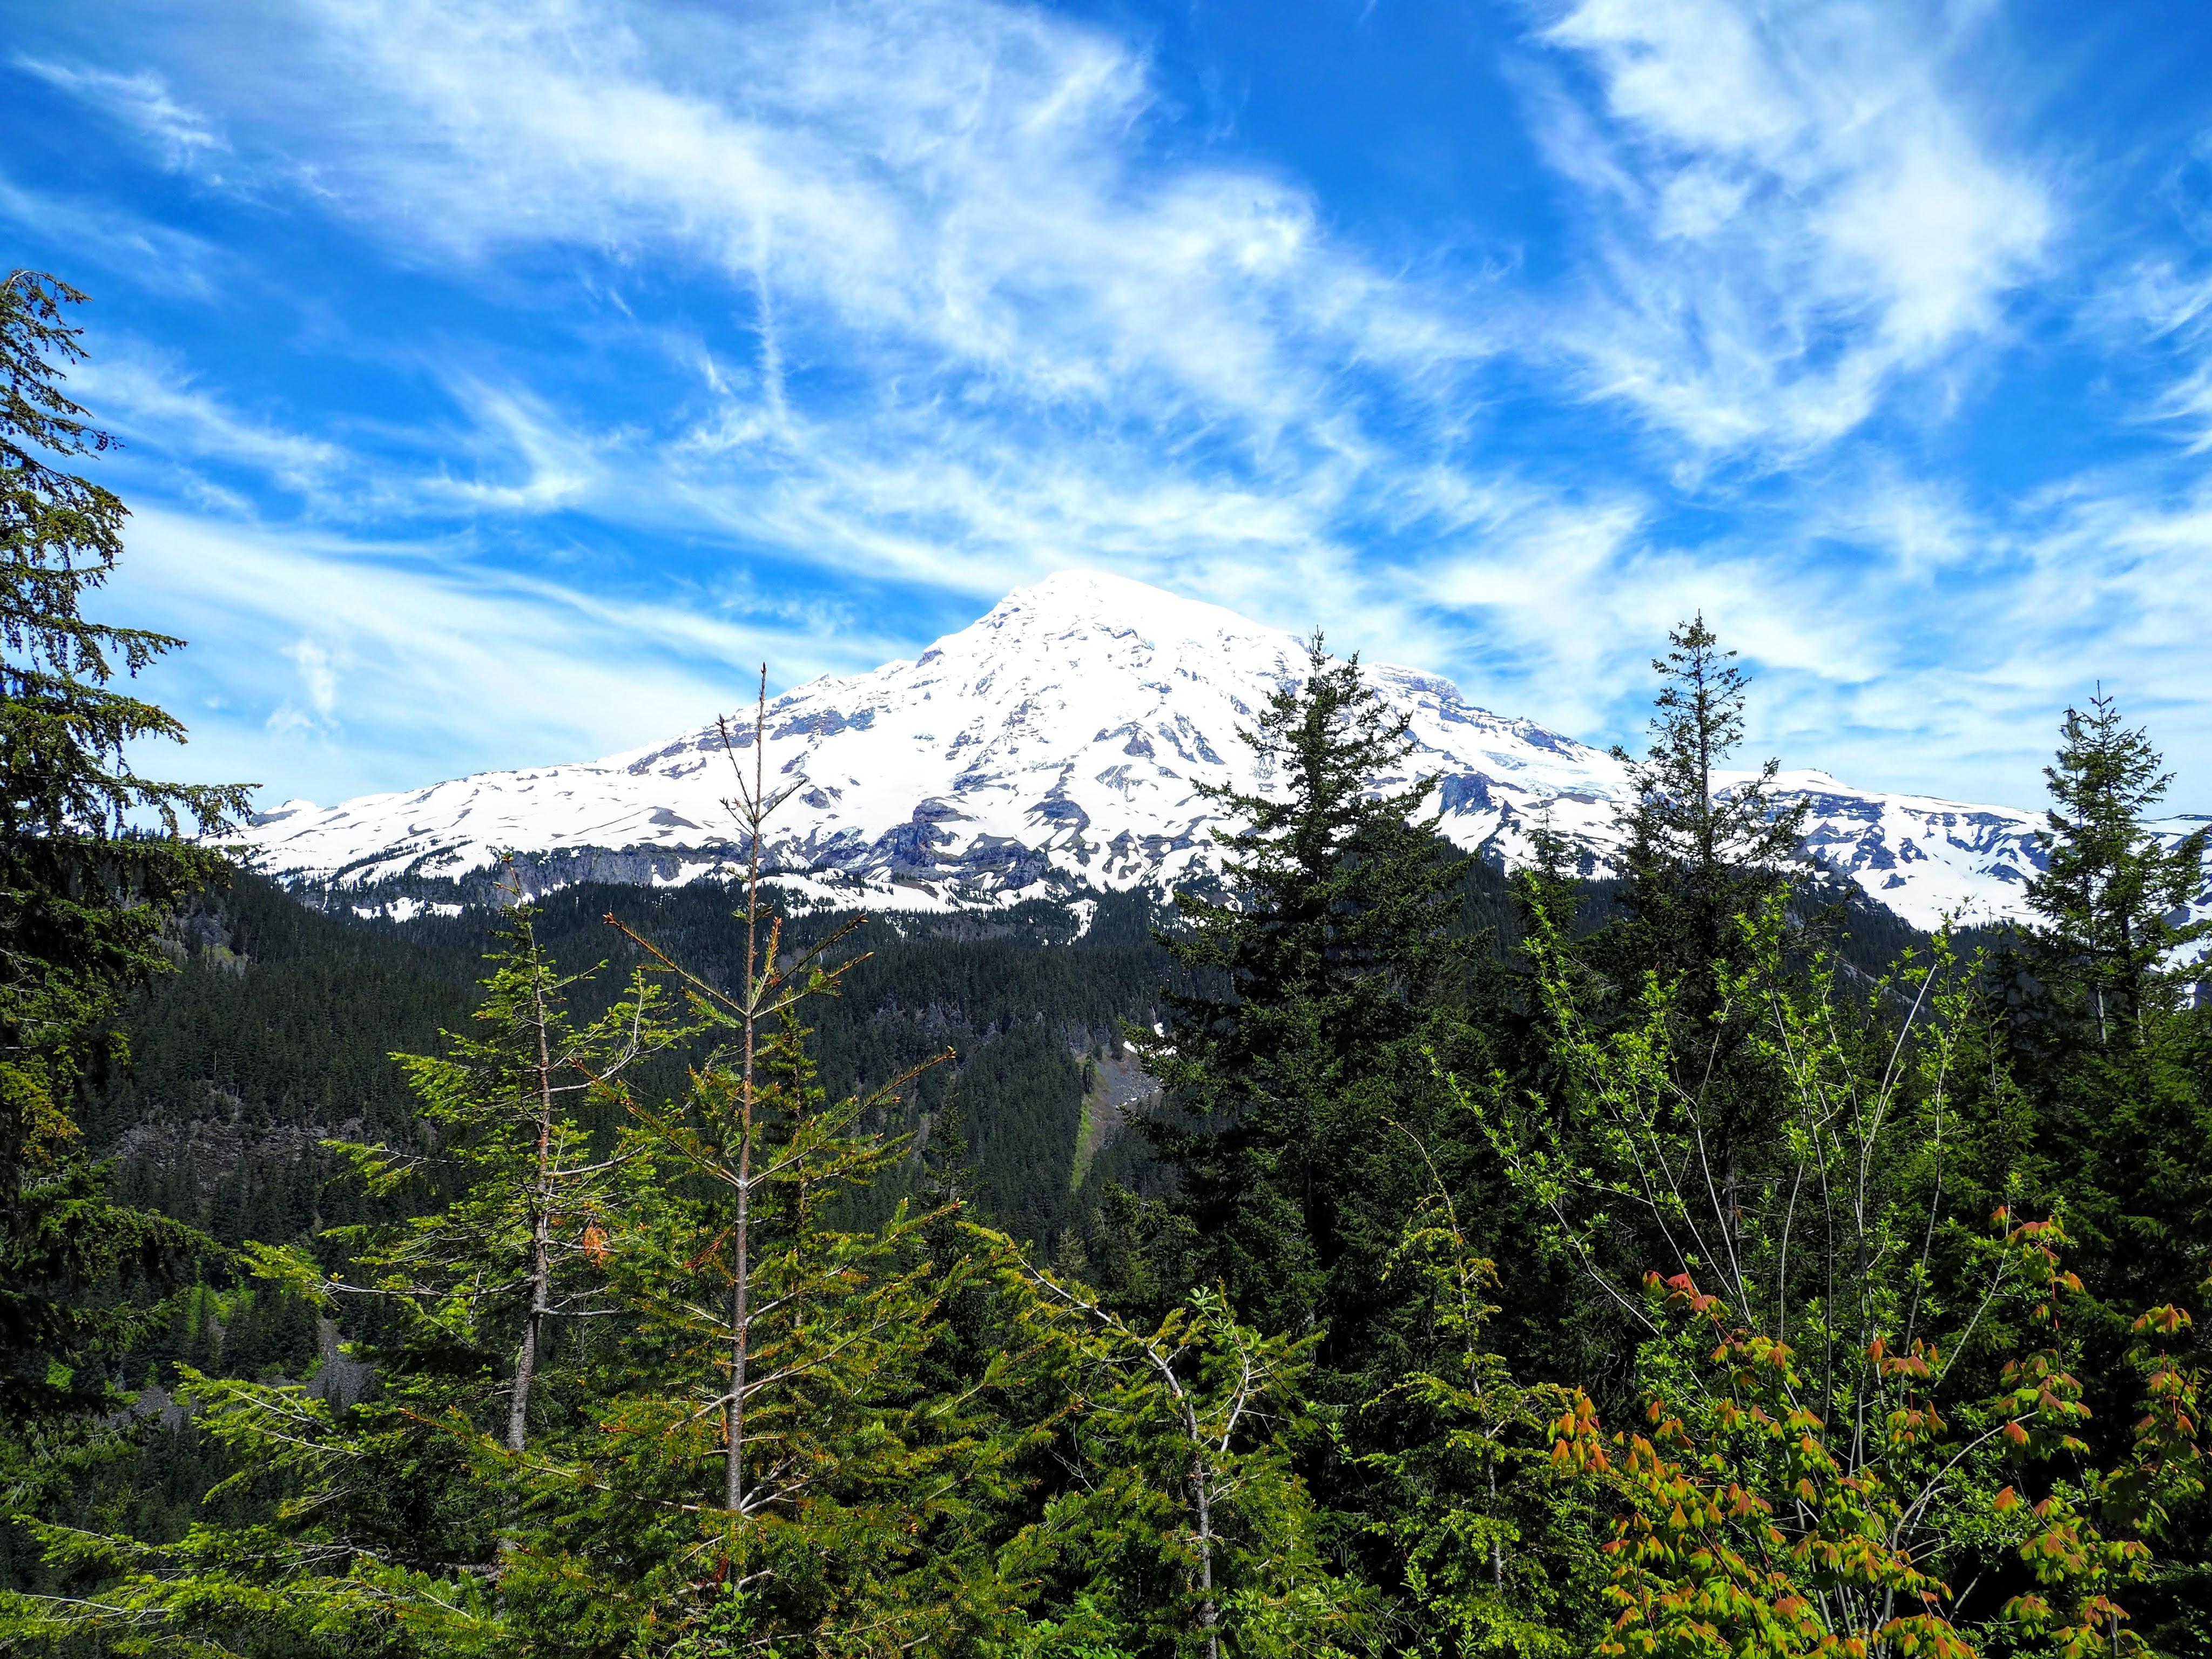 The Mysteries of Mount Rainier